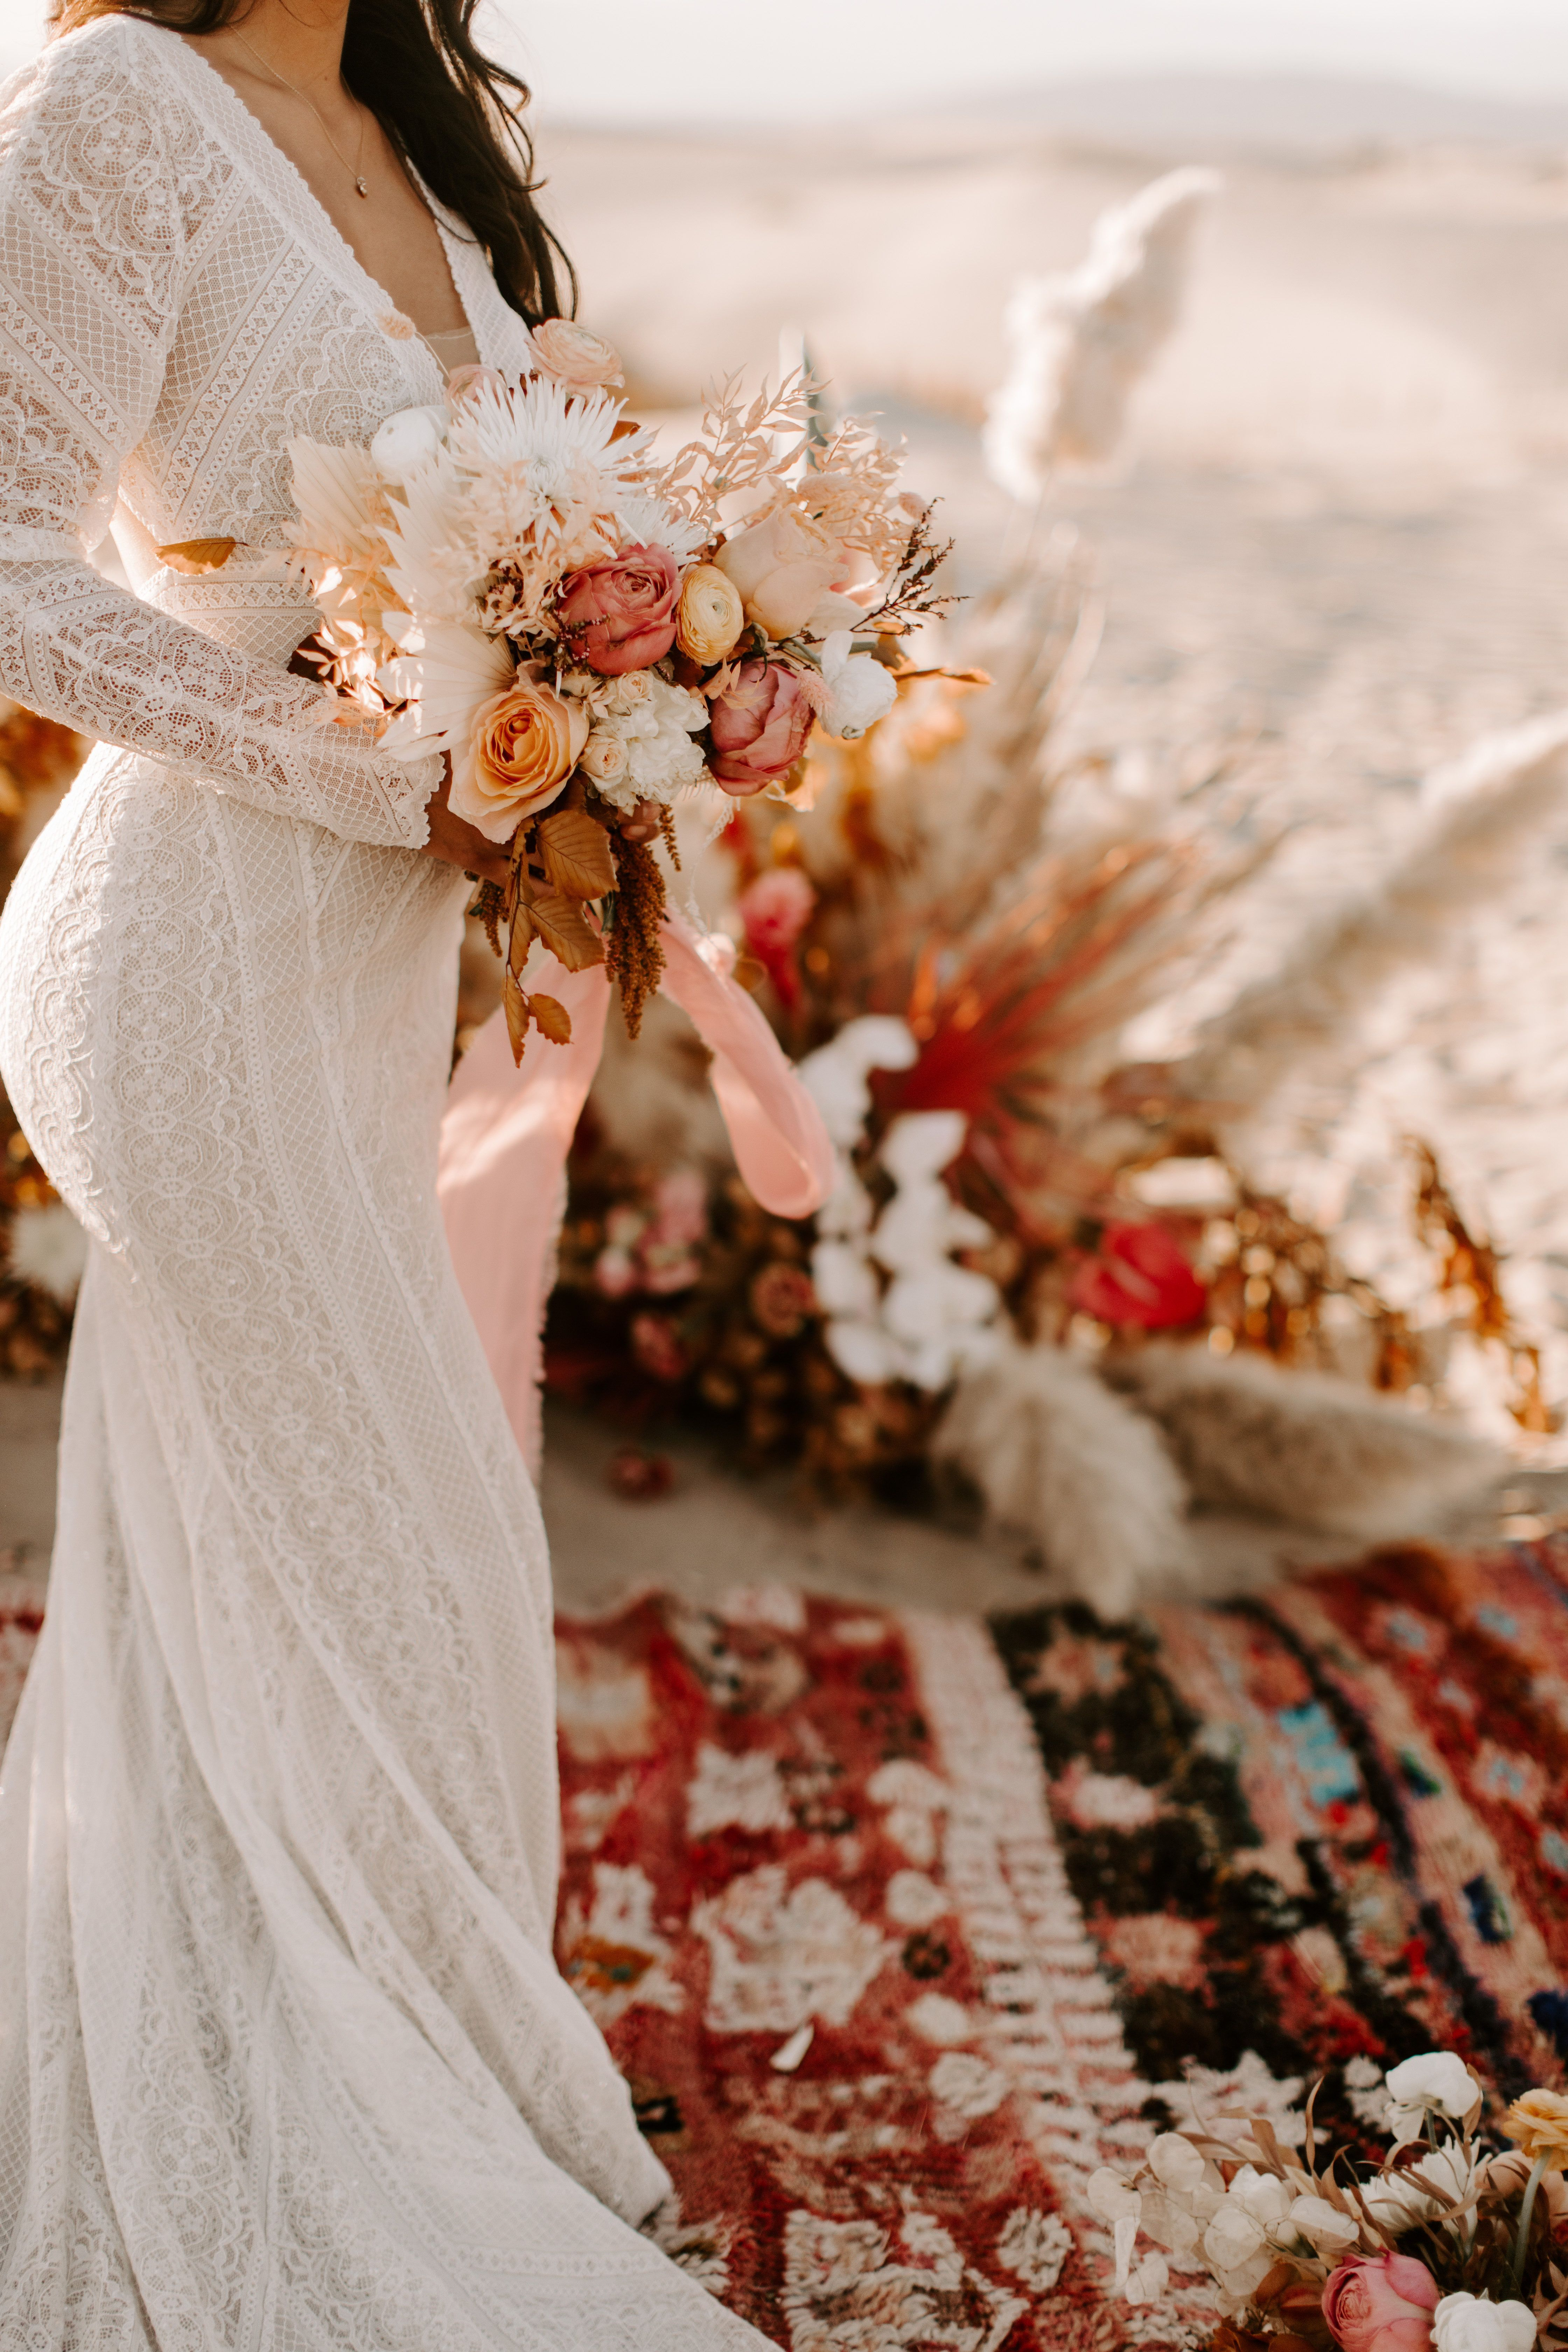 Garden Wedding Dress Discover Summer Gown From Bhldn Outdoor Wedding Dress Floral Wedding Dress Boho Outdoor Wedding [ 6720 x 4480 Pixel ]